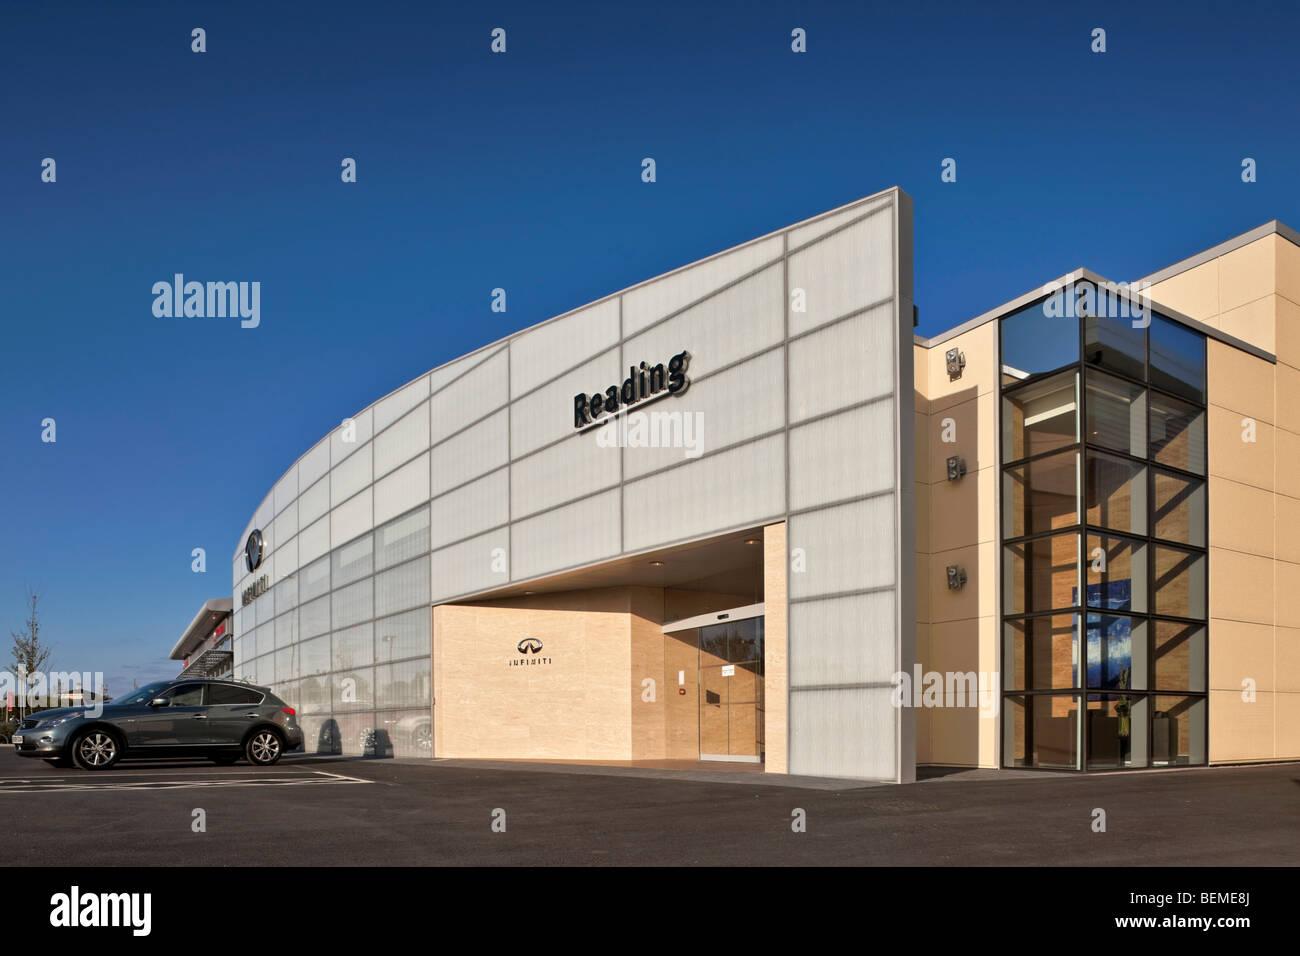 Infiniti Car Showroom in Reading - Stock Image